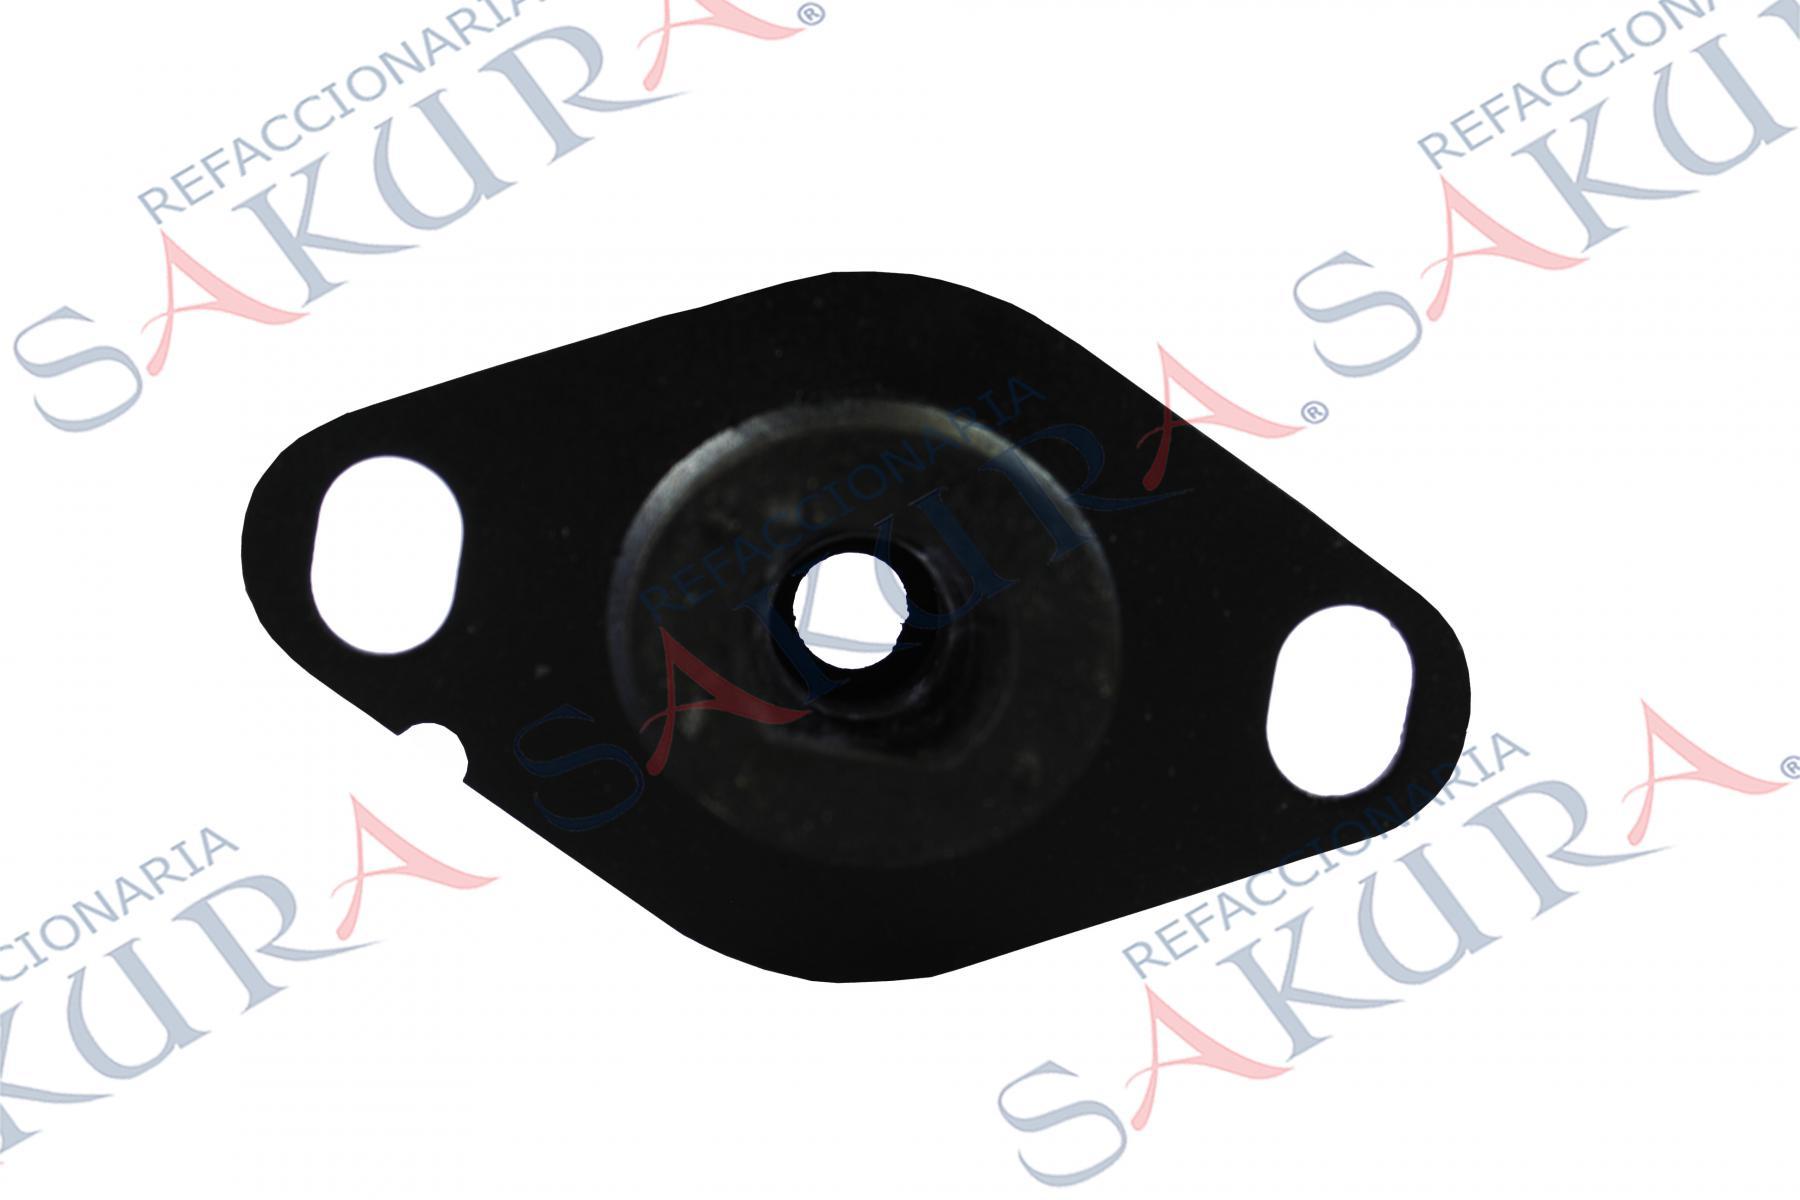 11220-00QAB, Soporte Caja Velocidades  (Safety)